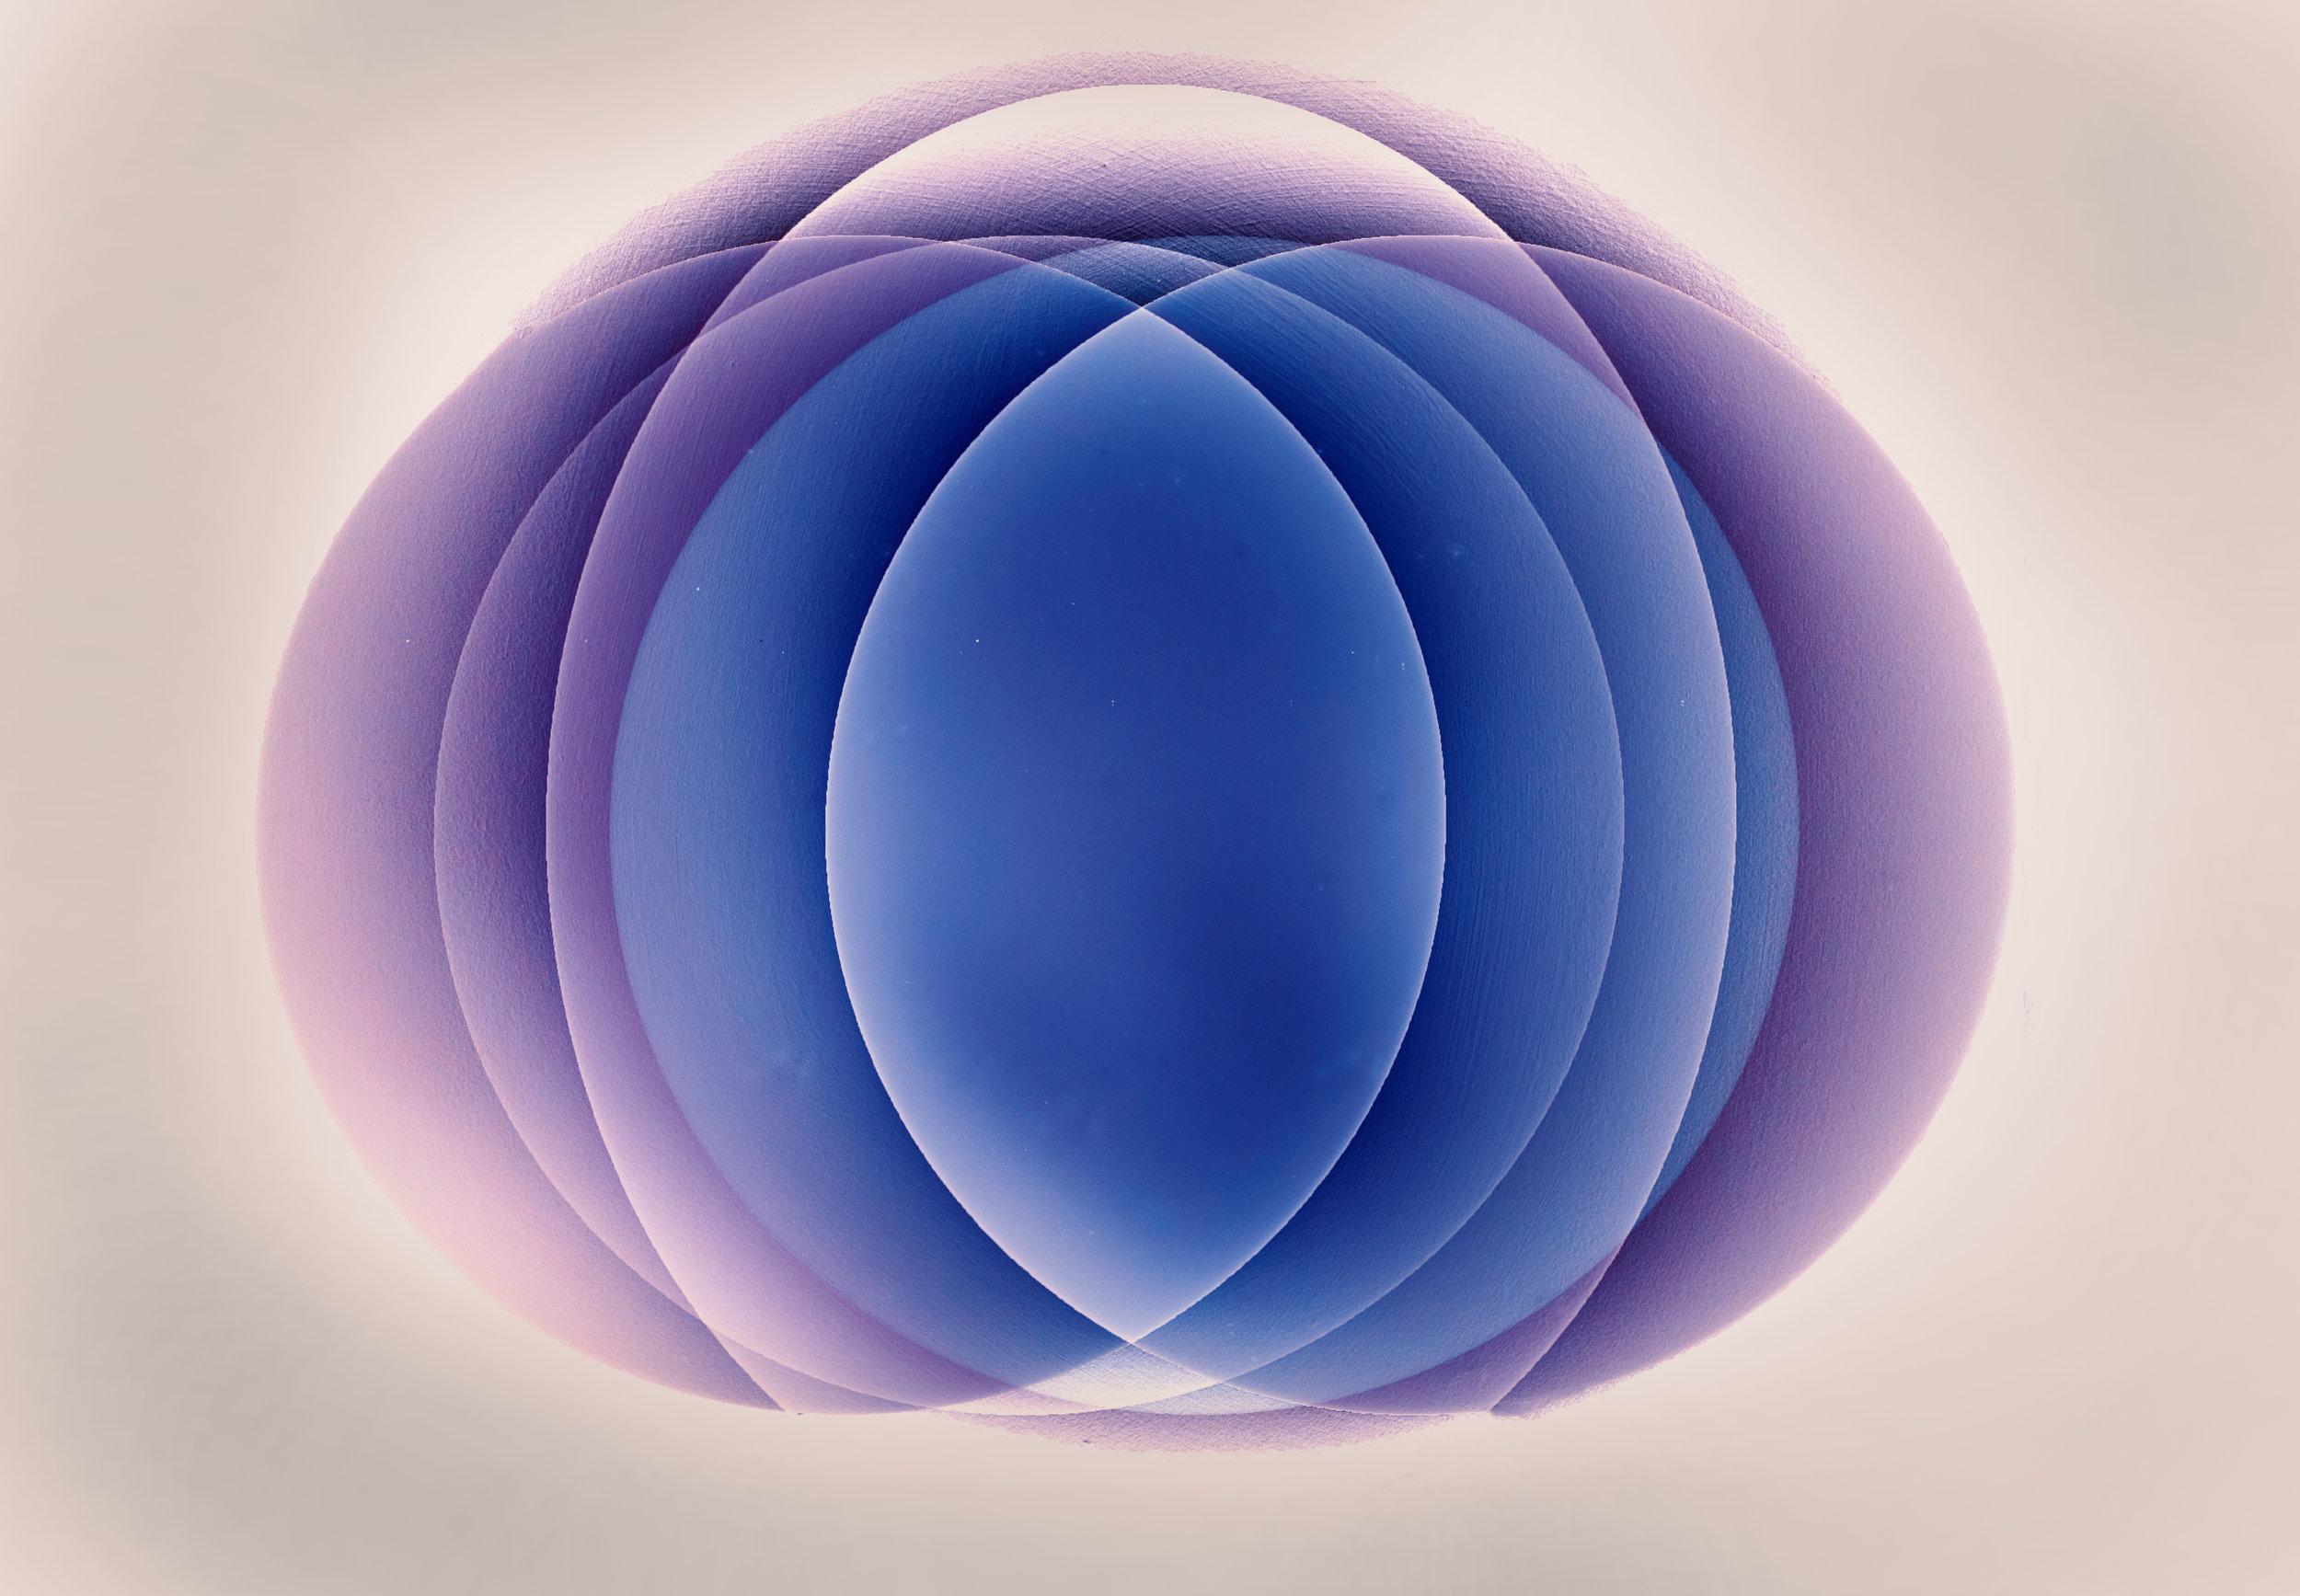 Blue and Purple Lotus